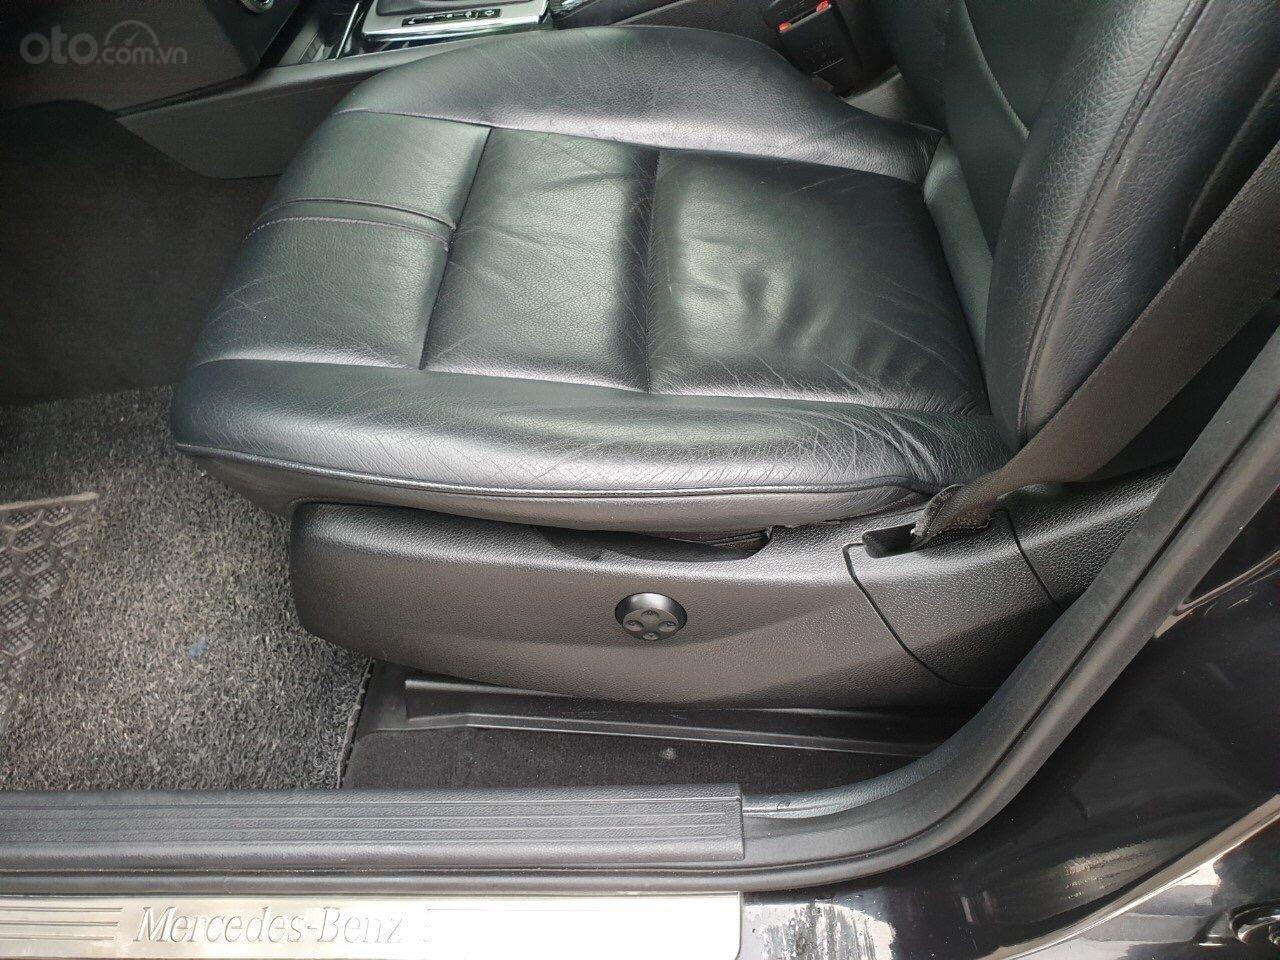 Cần bán Mercedes GLK300 đời 2009, màu đen (6)